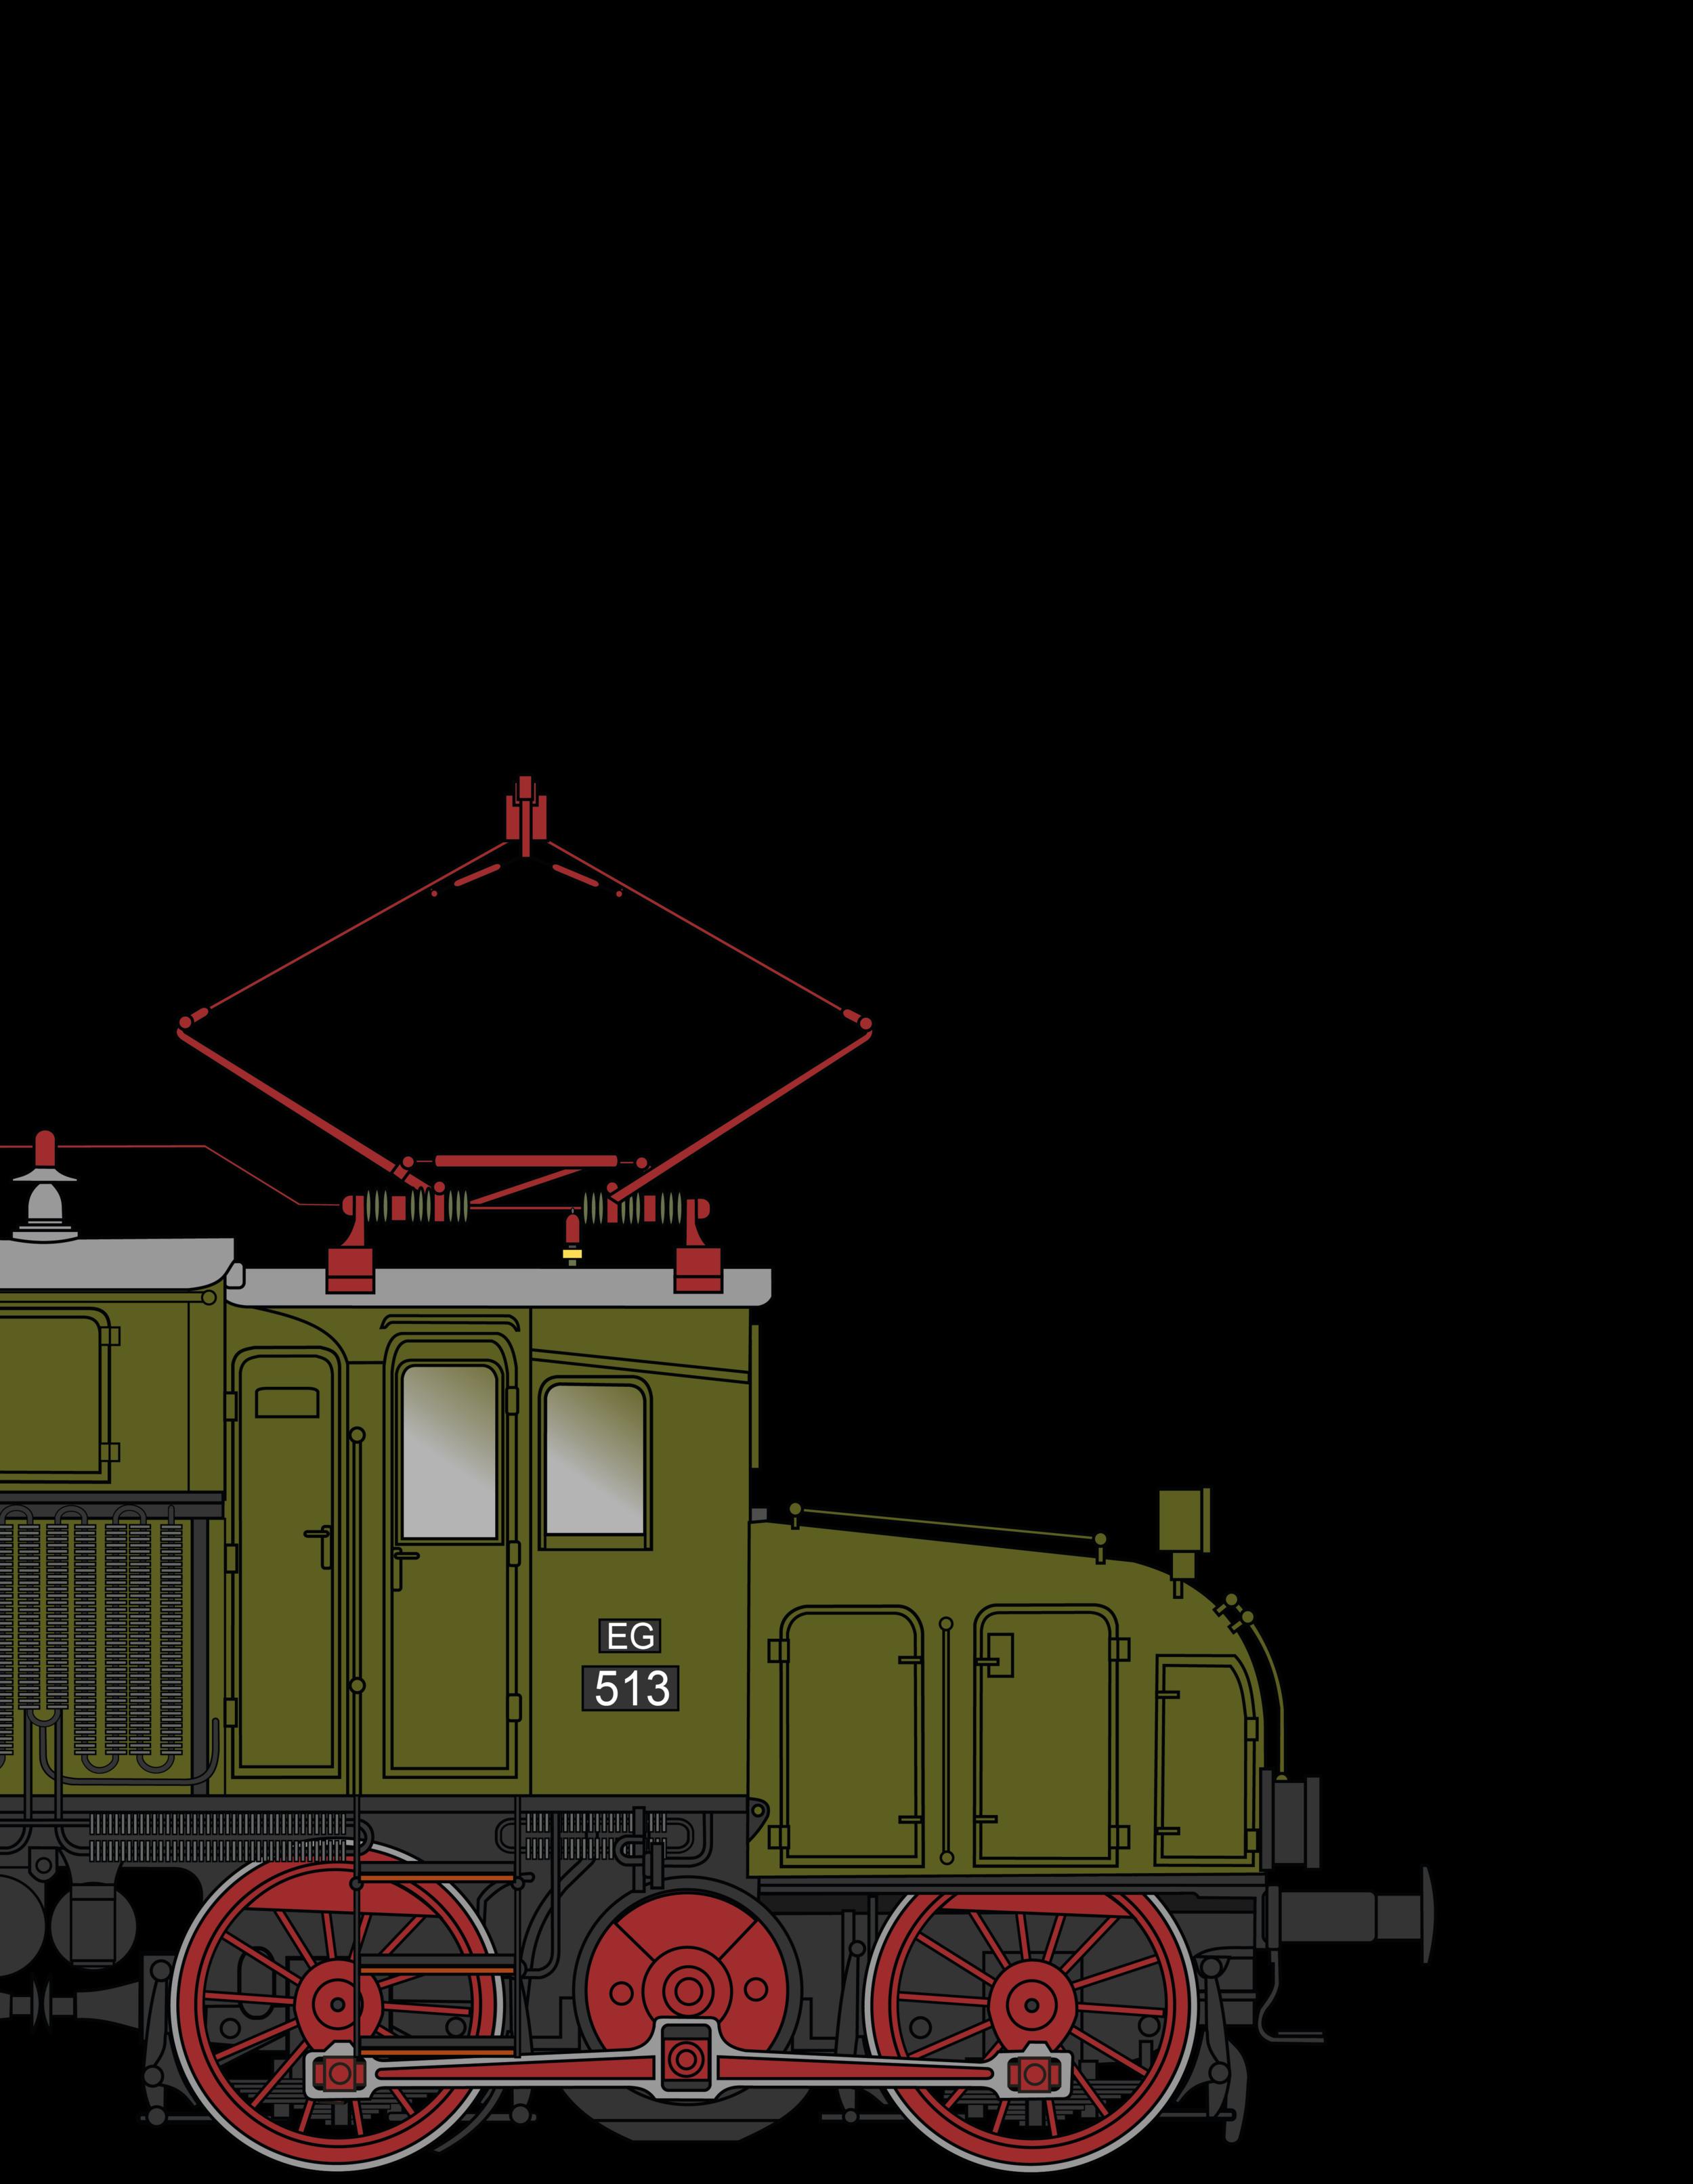 EG Reihe 511/E71 - Das preußische Krokodil